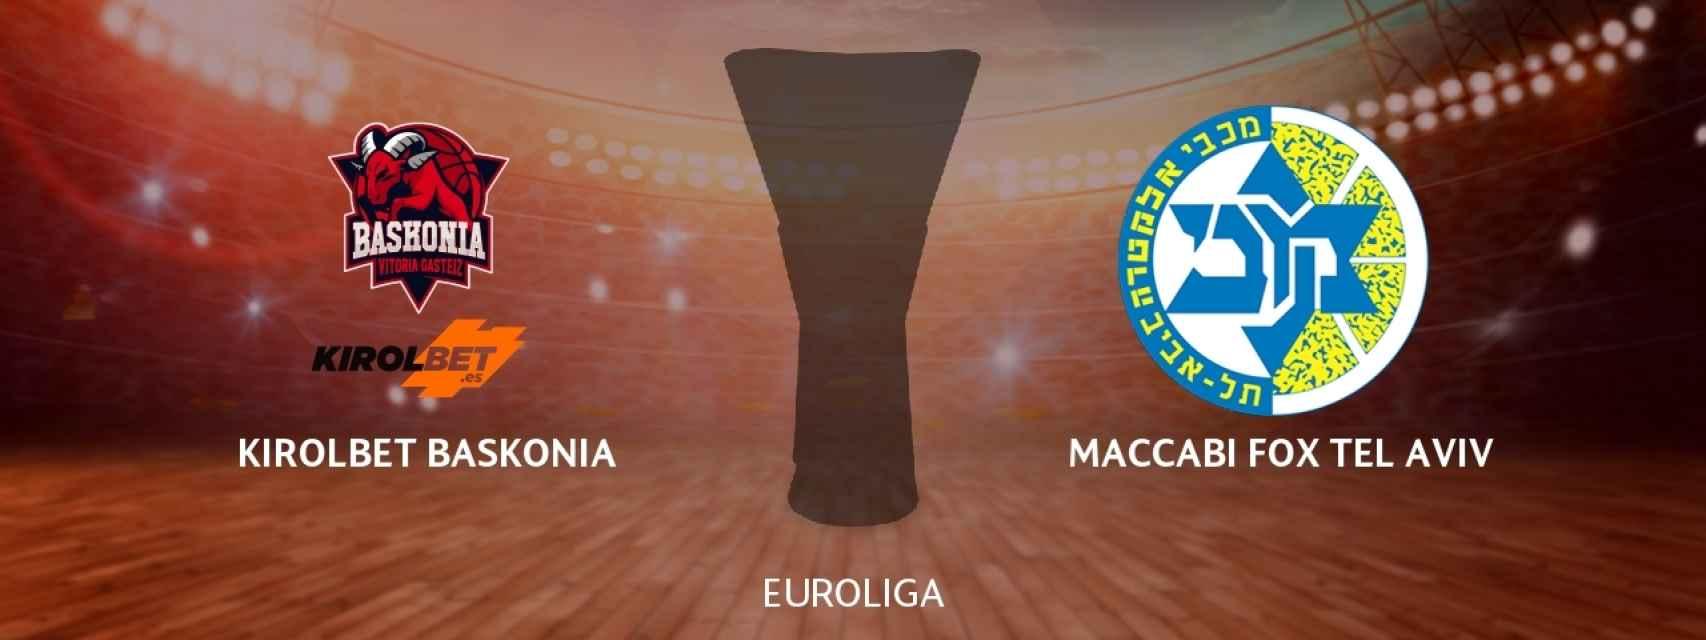 Kirolbet Baskonia - Maccabi Fox Tel Aviv